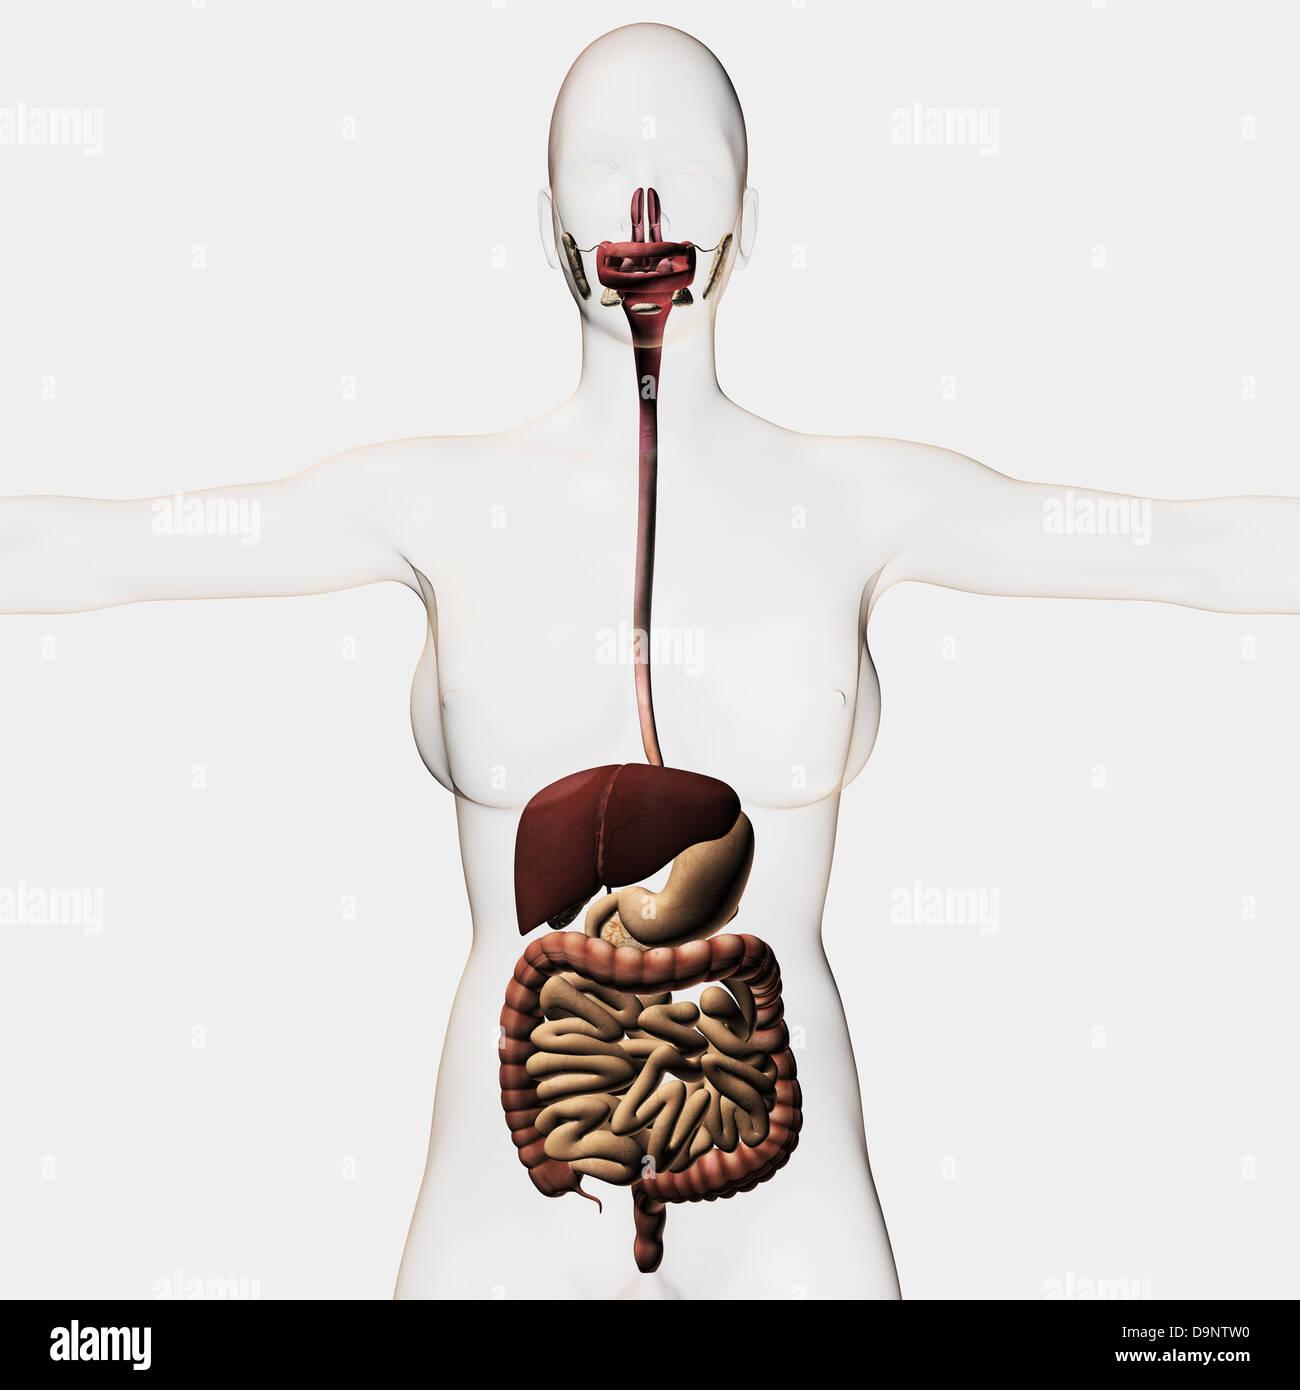 Medical Illustration Of The Human Digestive System Three